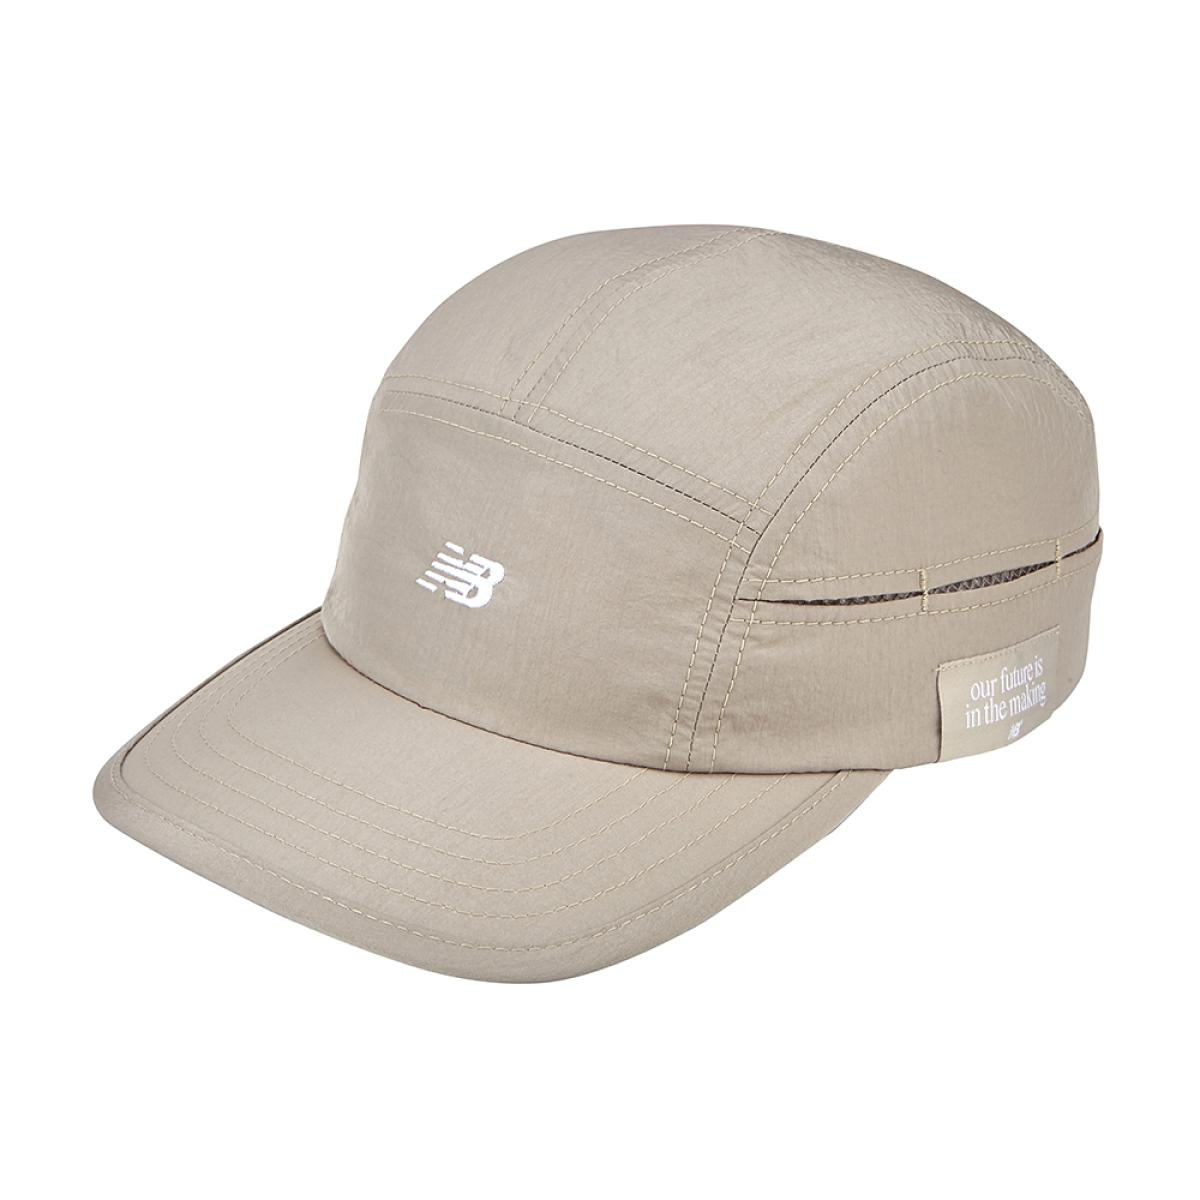 Light Camp Cap